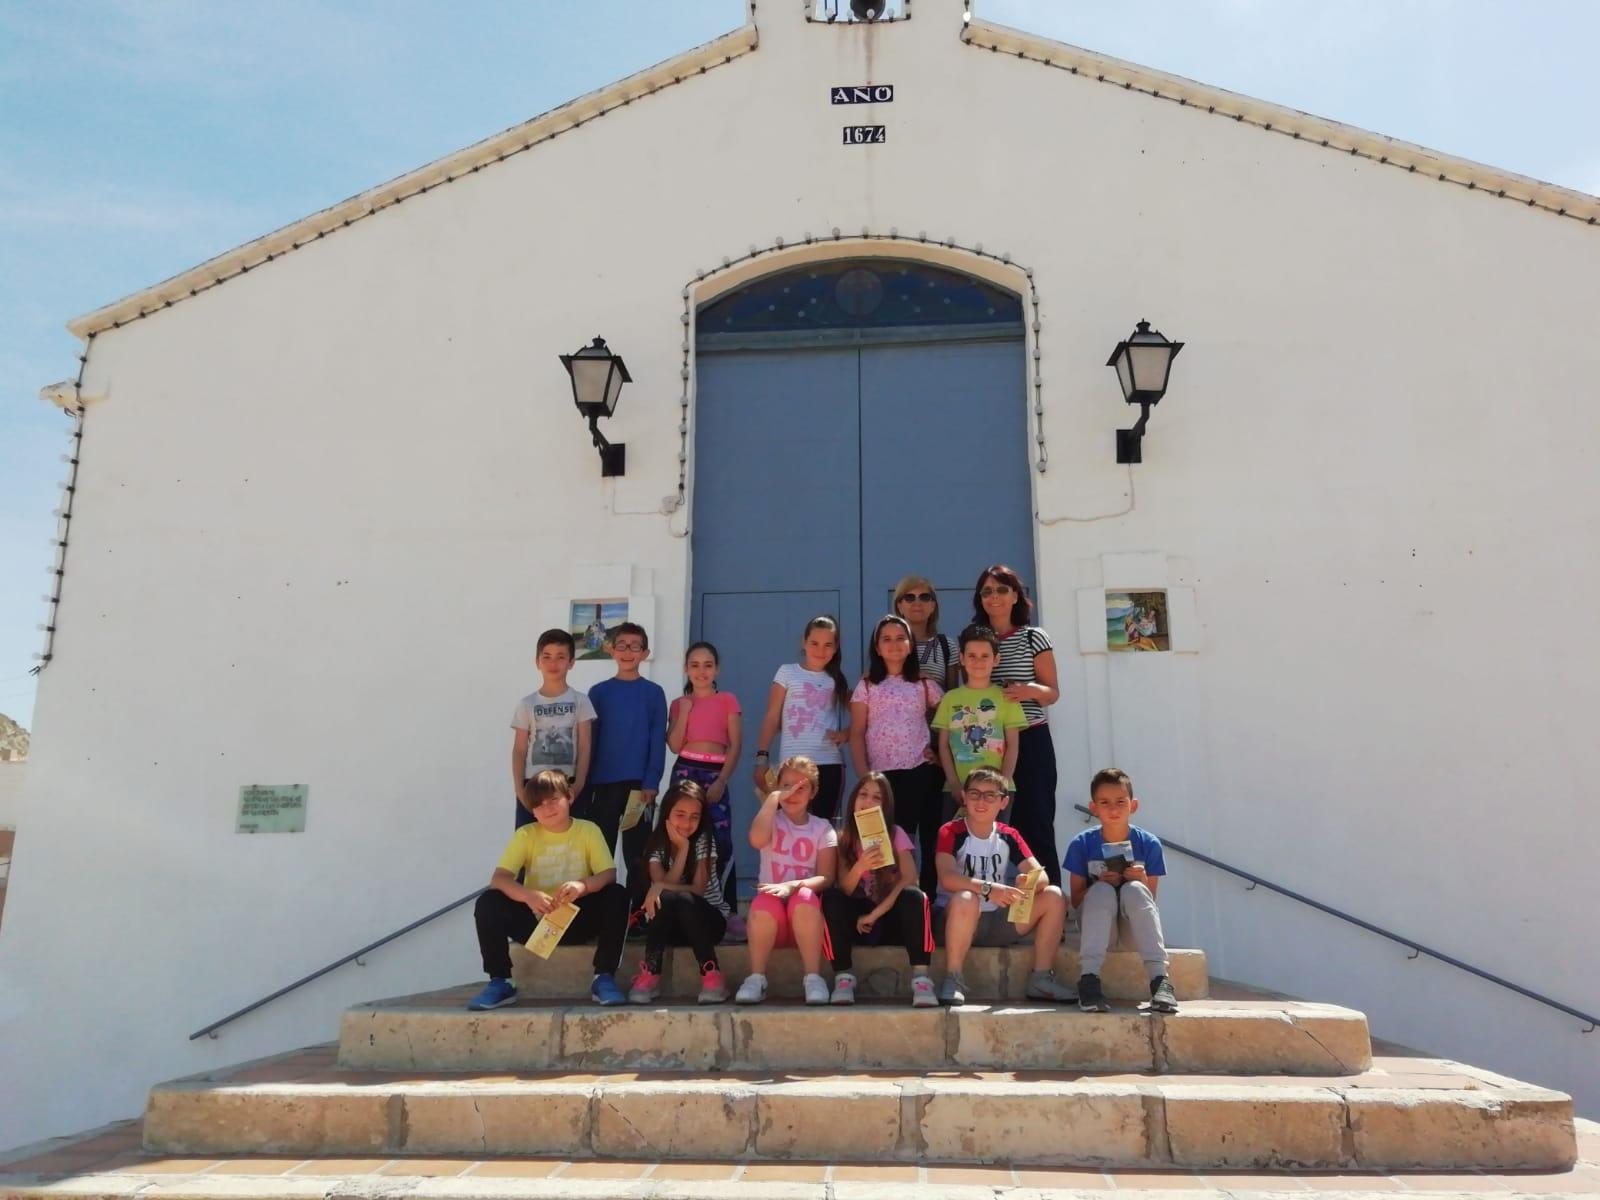 (2019-05-23) Visita ermita alumnos Laura - 3 C primaria - Reina Sofia - María Isabel Berenguer (07)